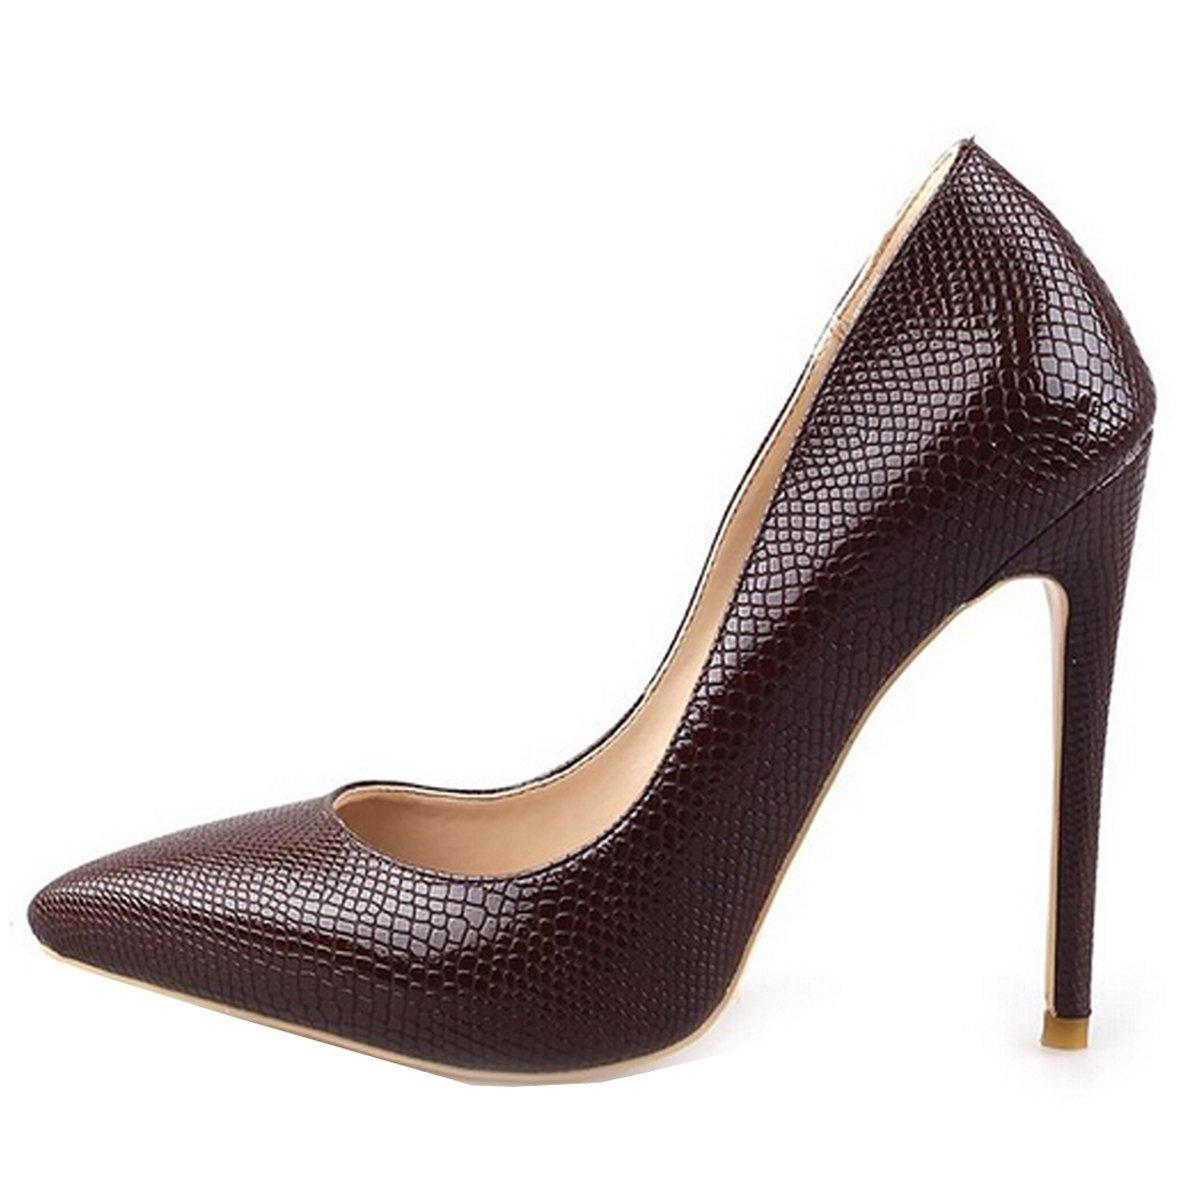 Jushee Damen Sexy Klassische Schwarz Stiletto High Heels Kleid Buuml;ro Pumps43 EU/10 UK/12 US|Braun03